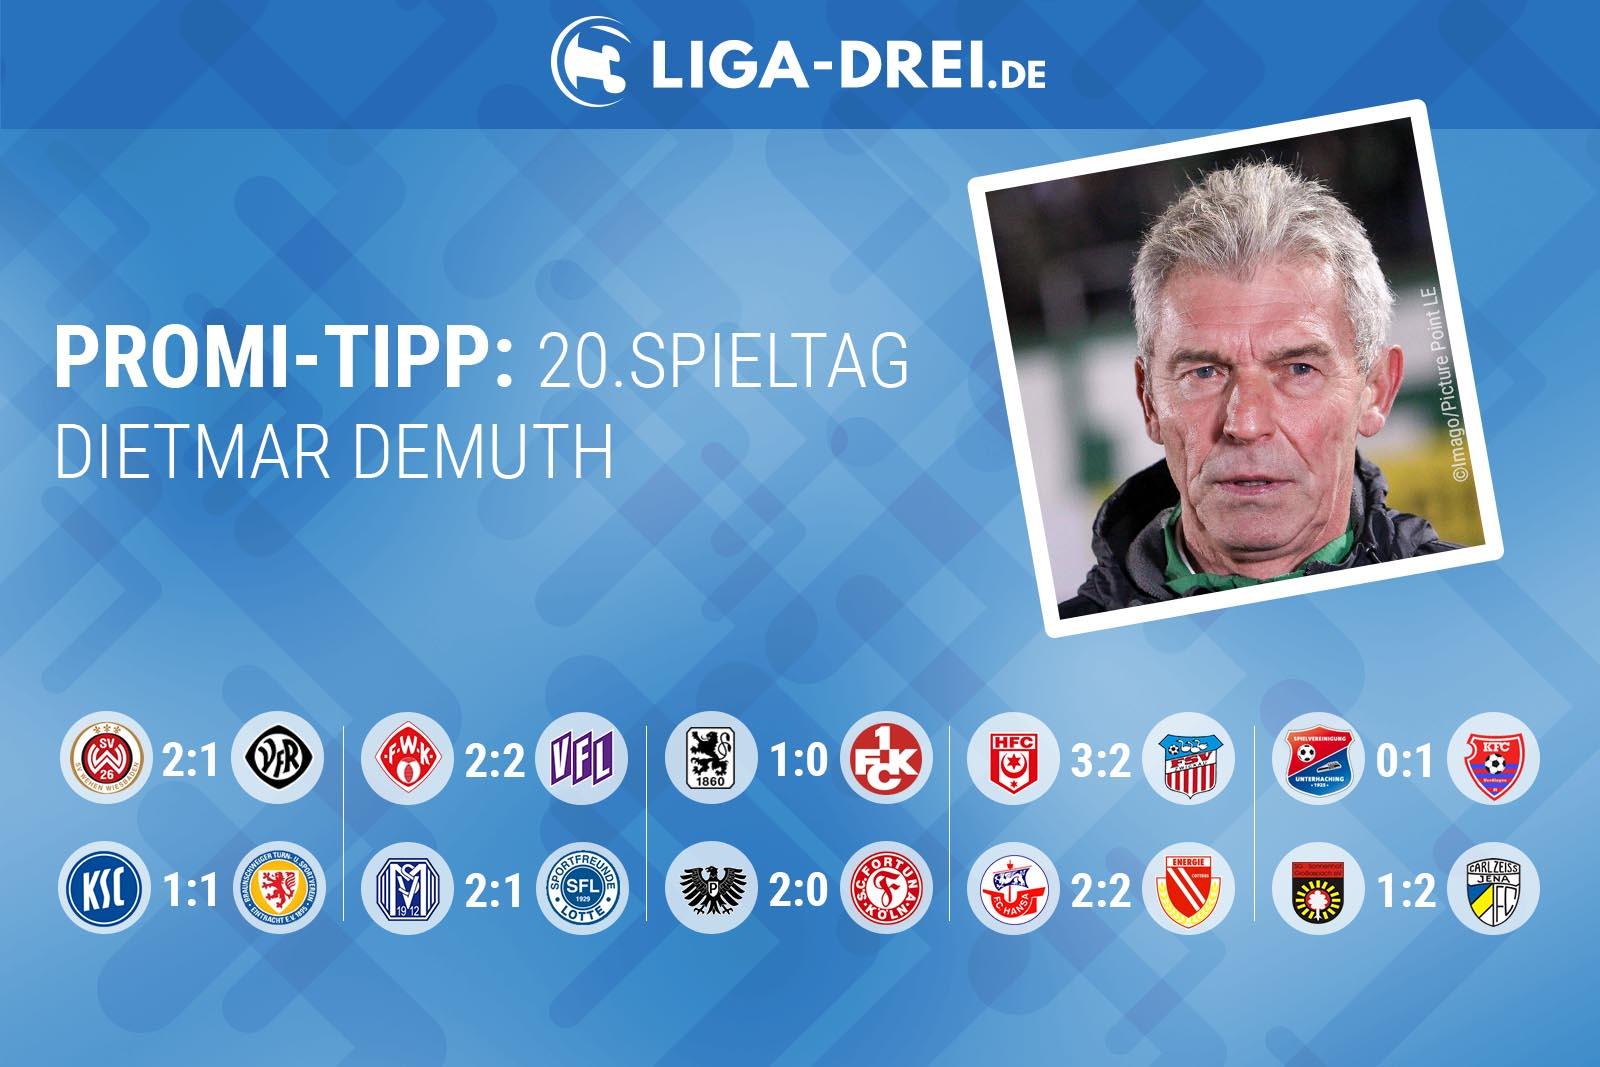 Dietmar Demuth beim Liga-Drei.de Promi-Tipp